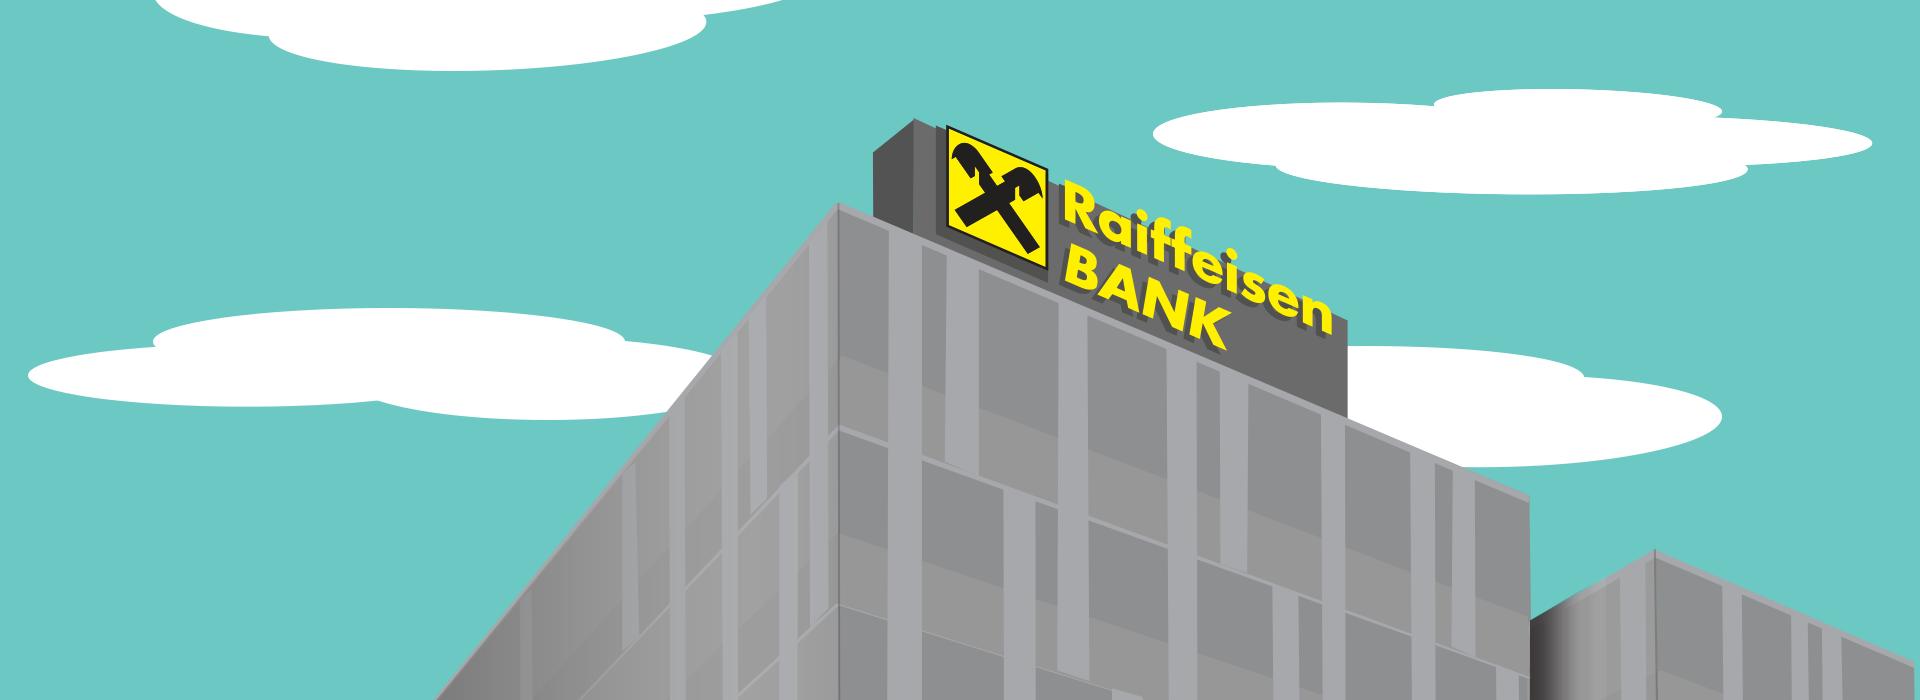 Rados by u ns Raiffeisen banka